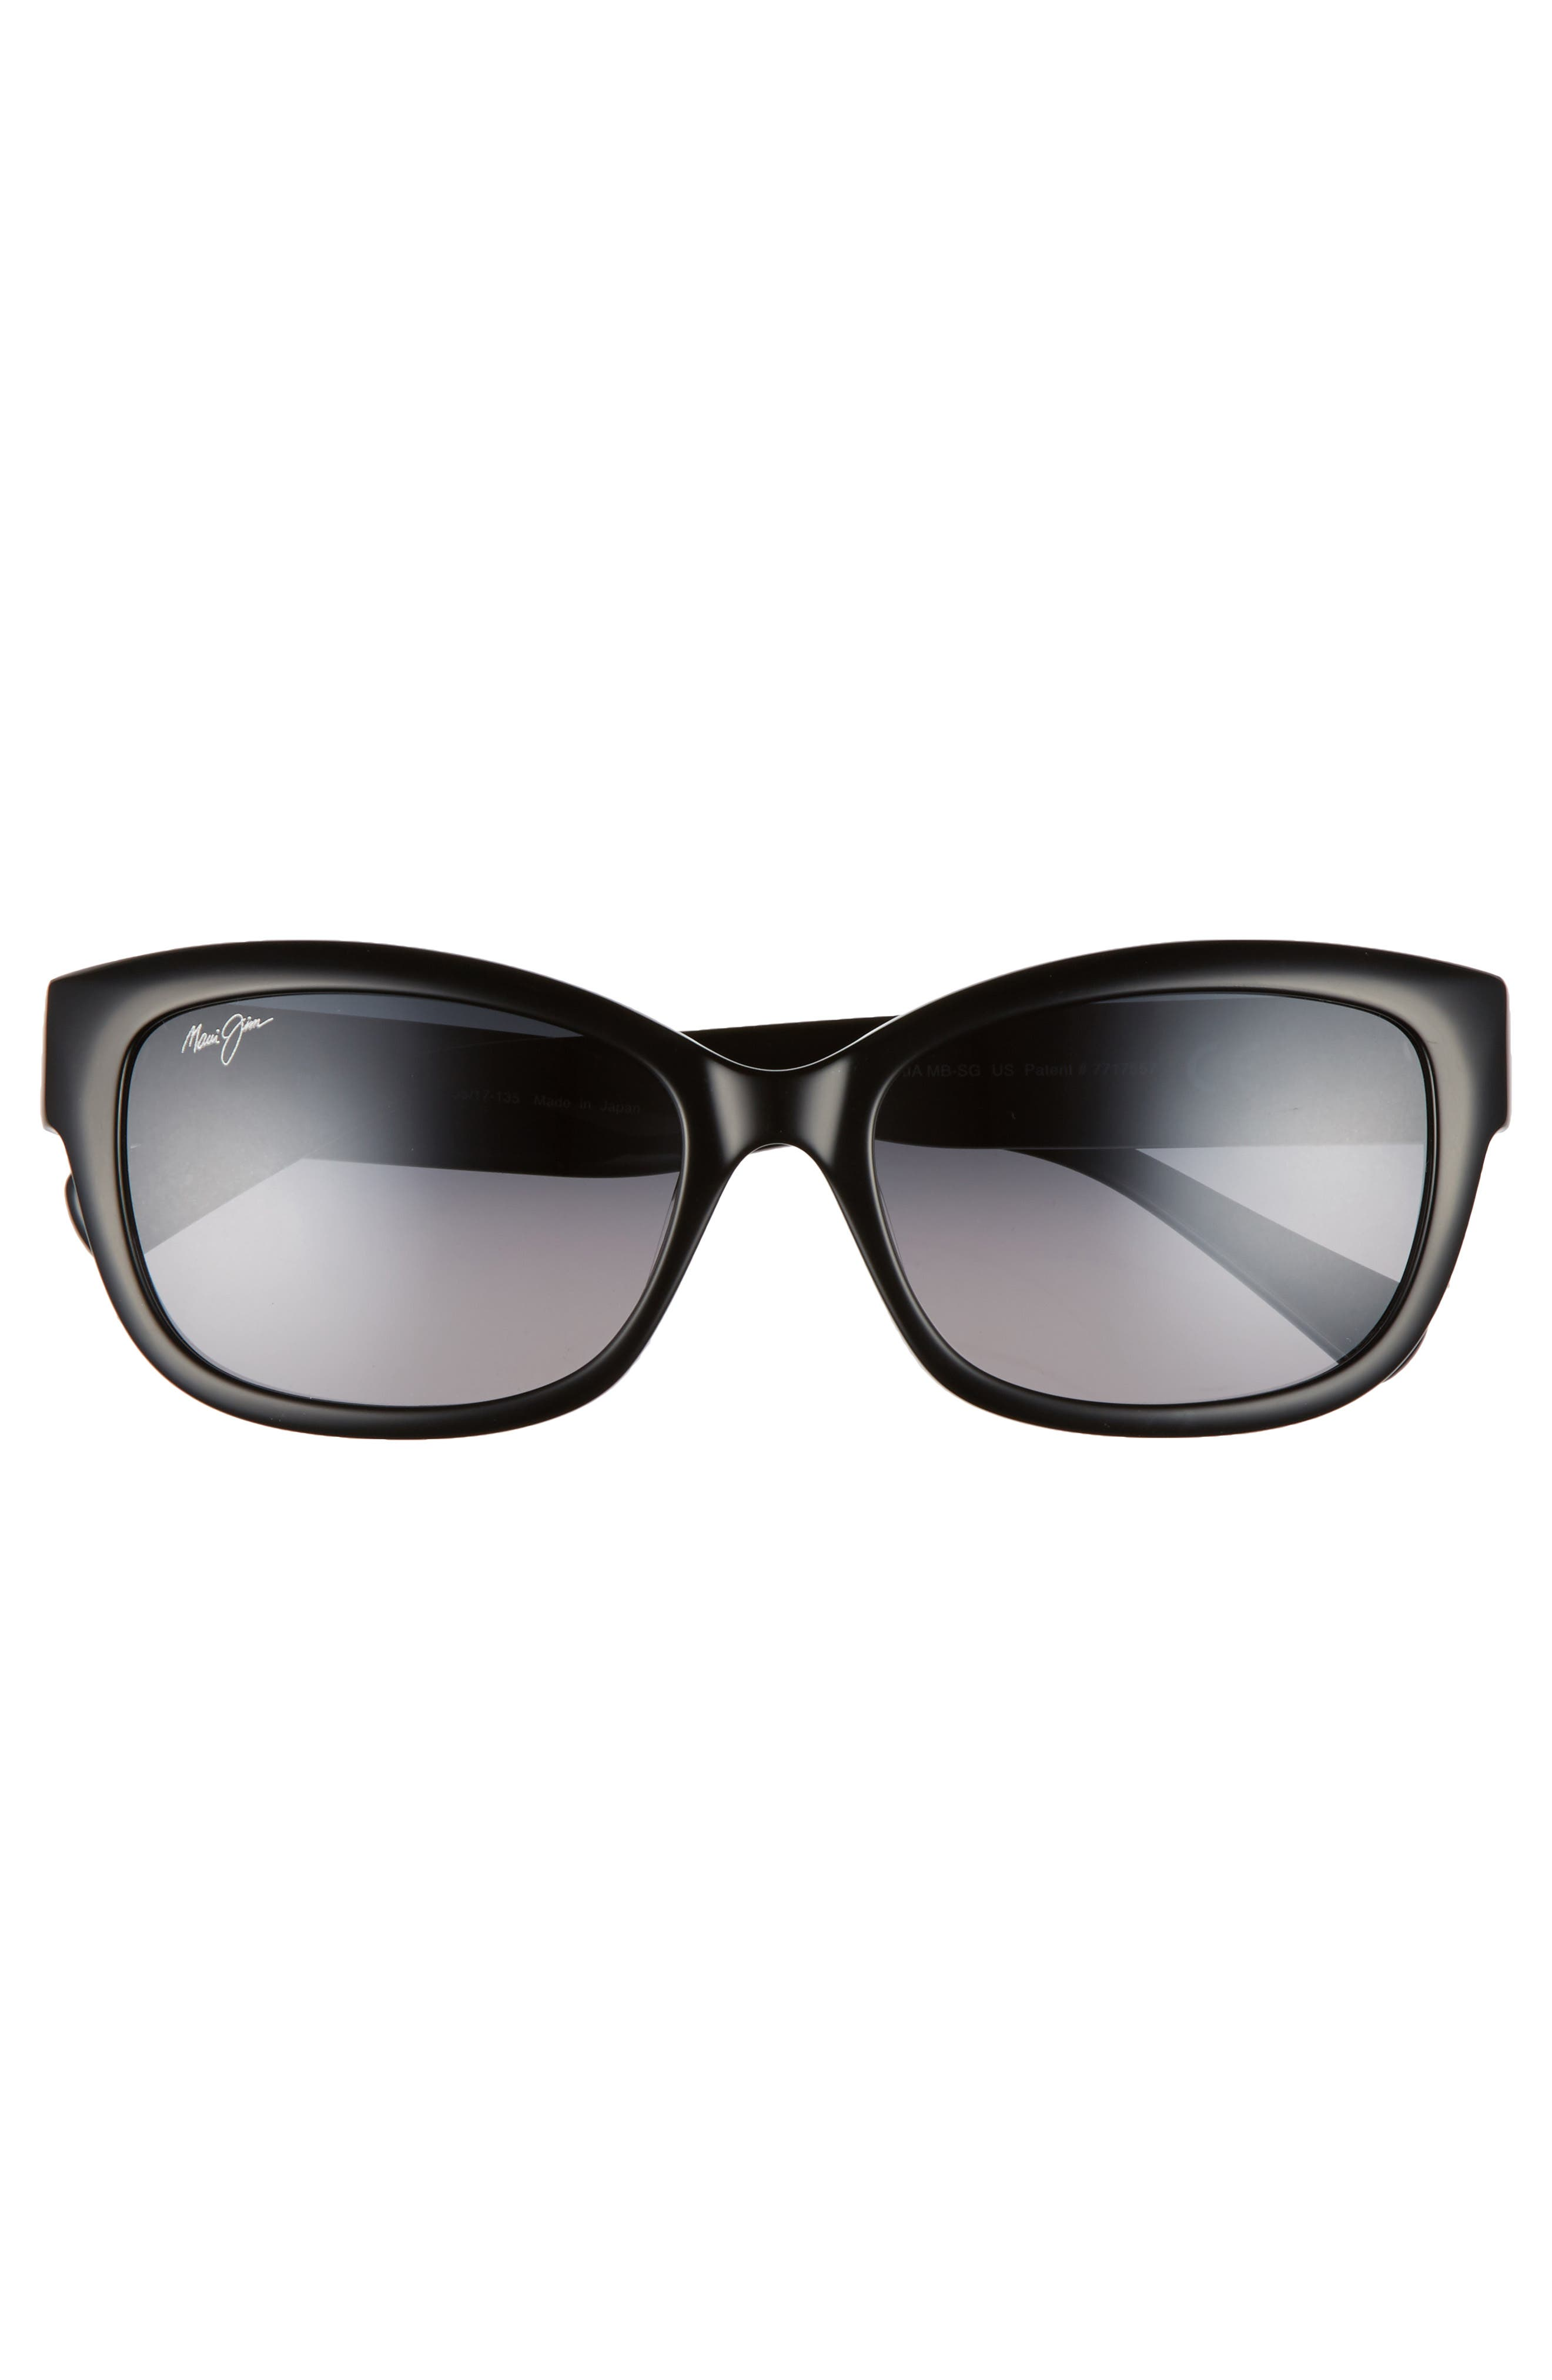 Plumeria 55mm Polarized Cat Eye Sunglasses,                             Alternate thumbnail 3, color,                             Gloss Black/ Neutral Grey